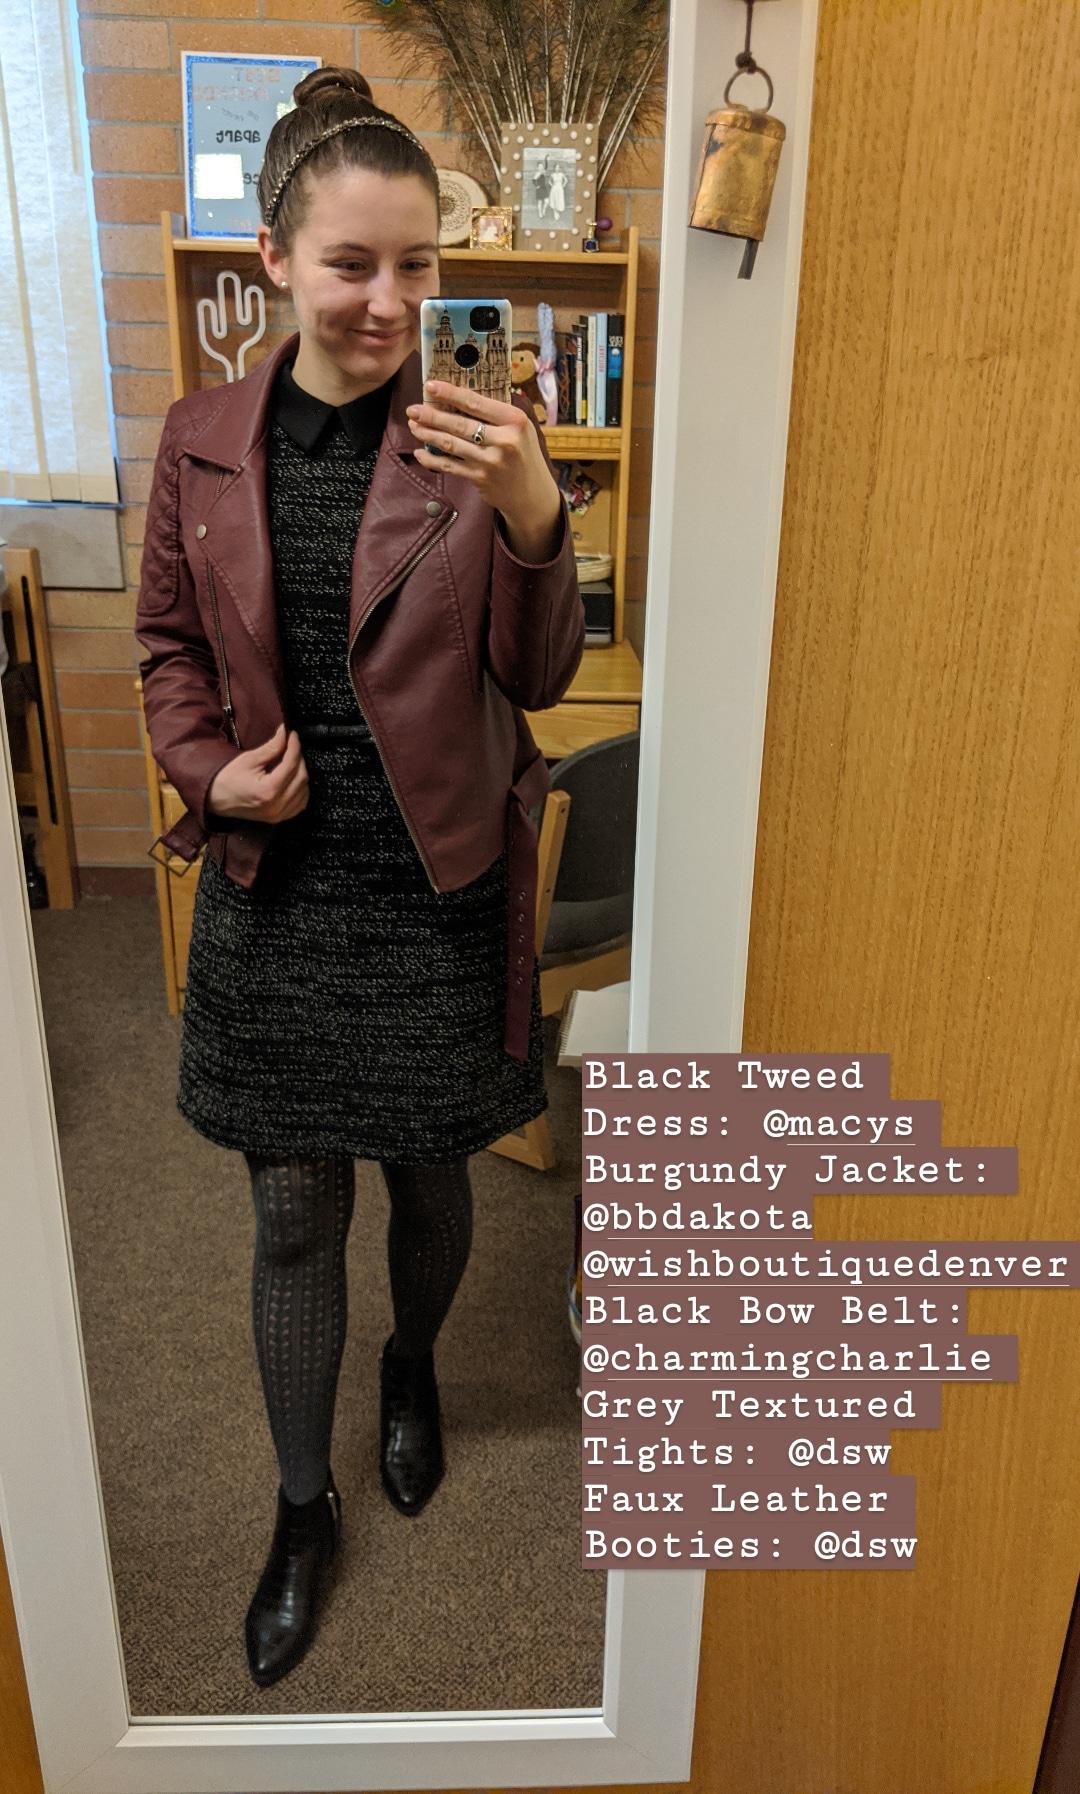 burgundy jacket, black collared dress, grey textured tights